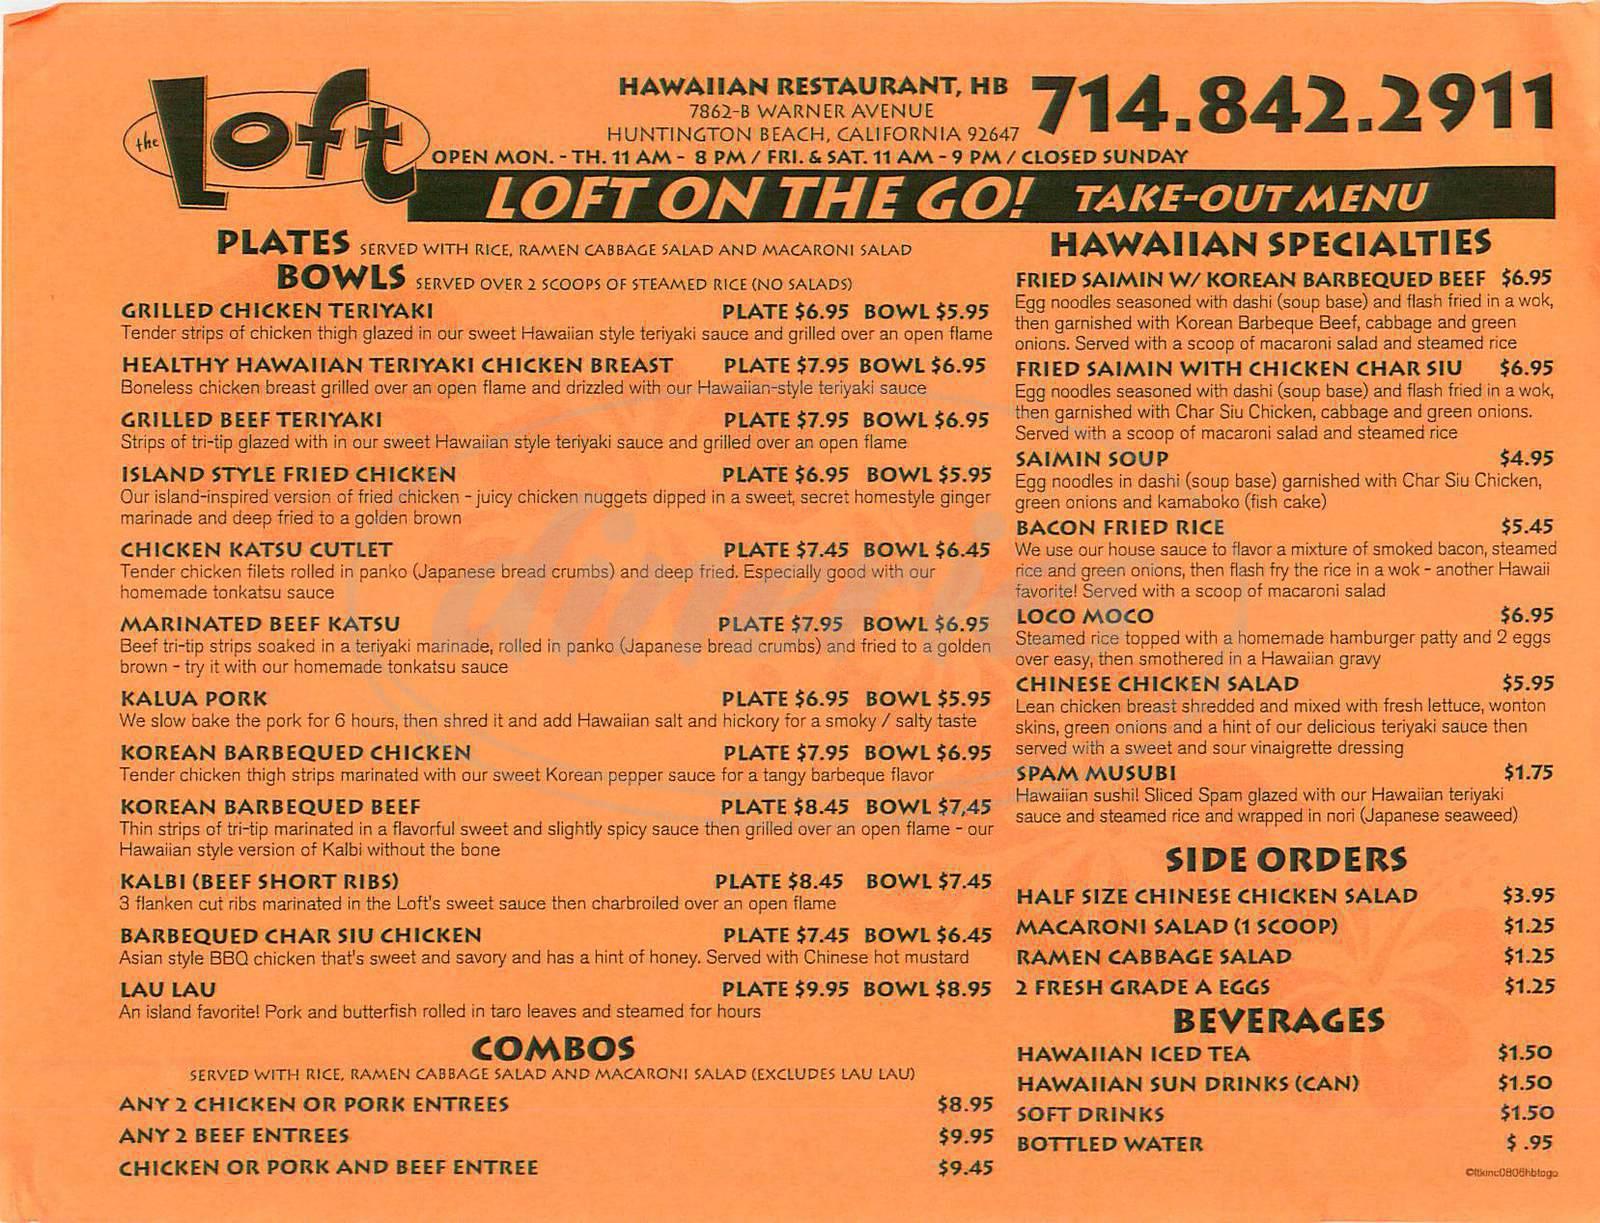 menu for The Loft